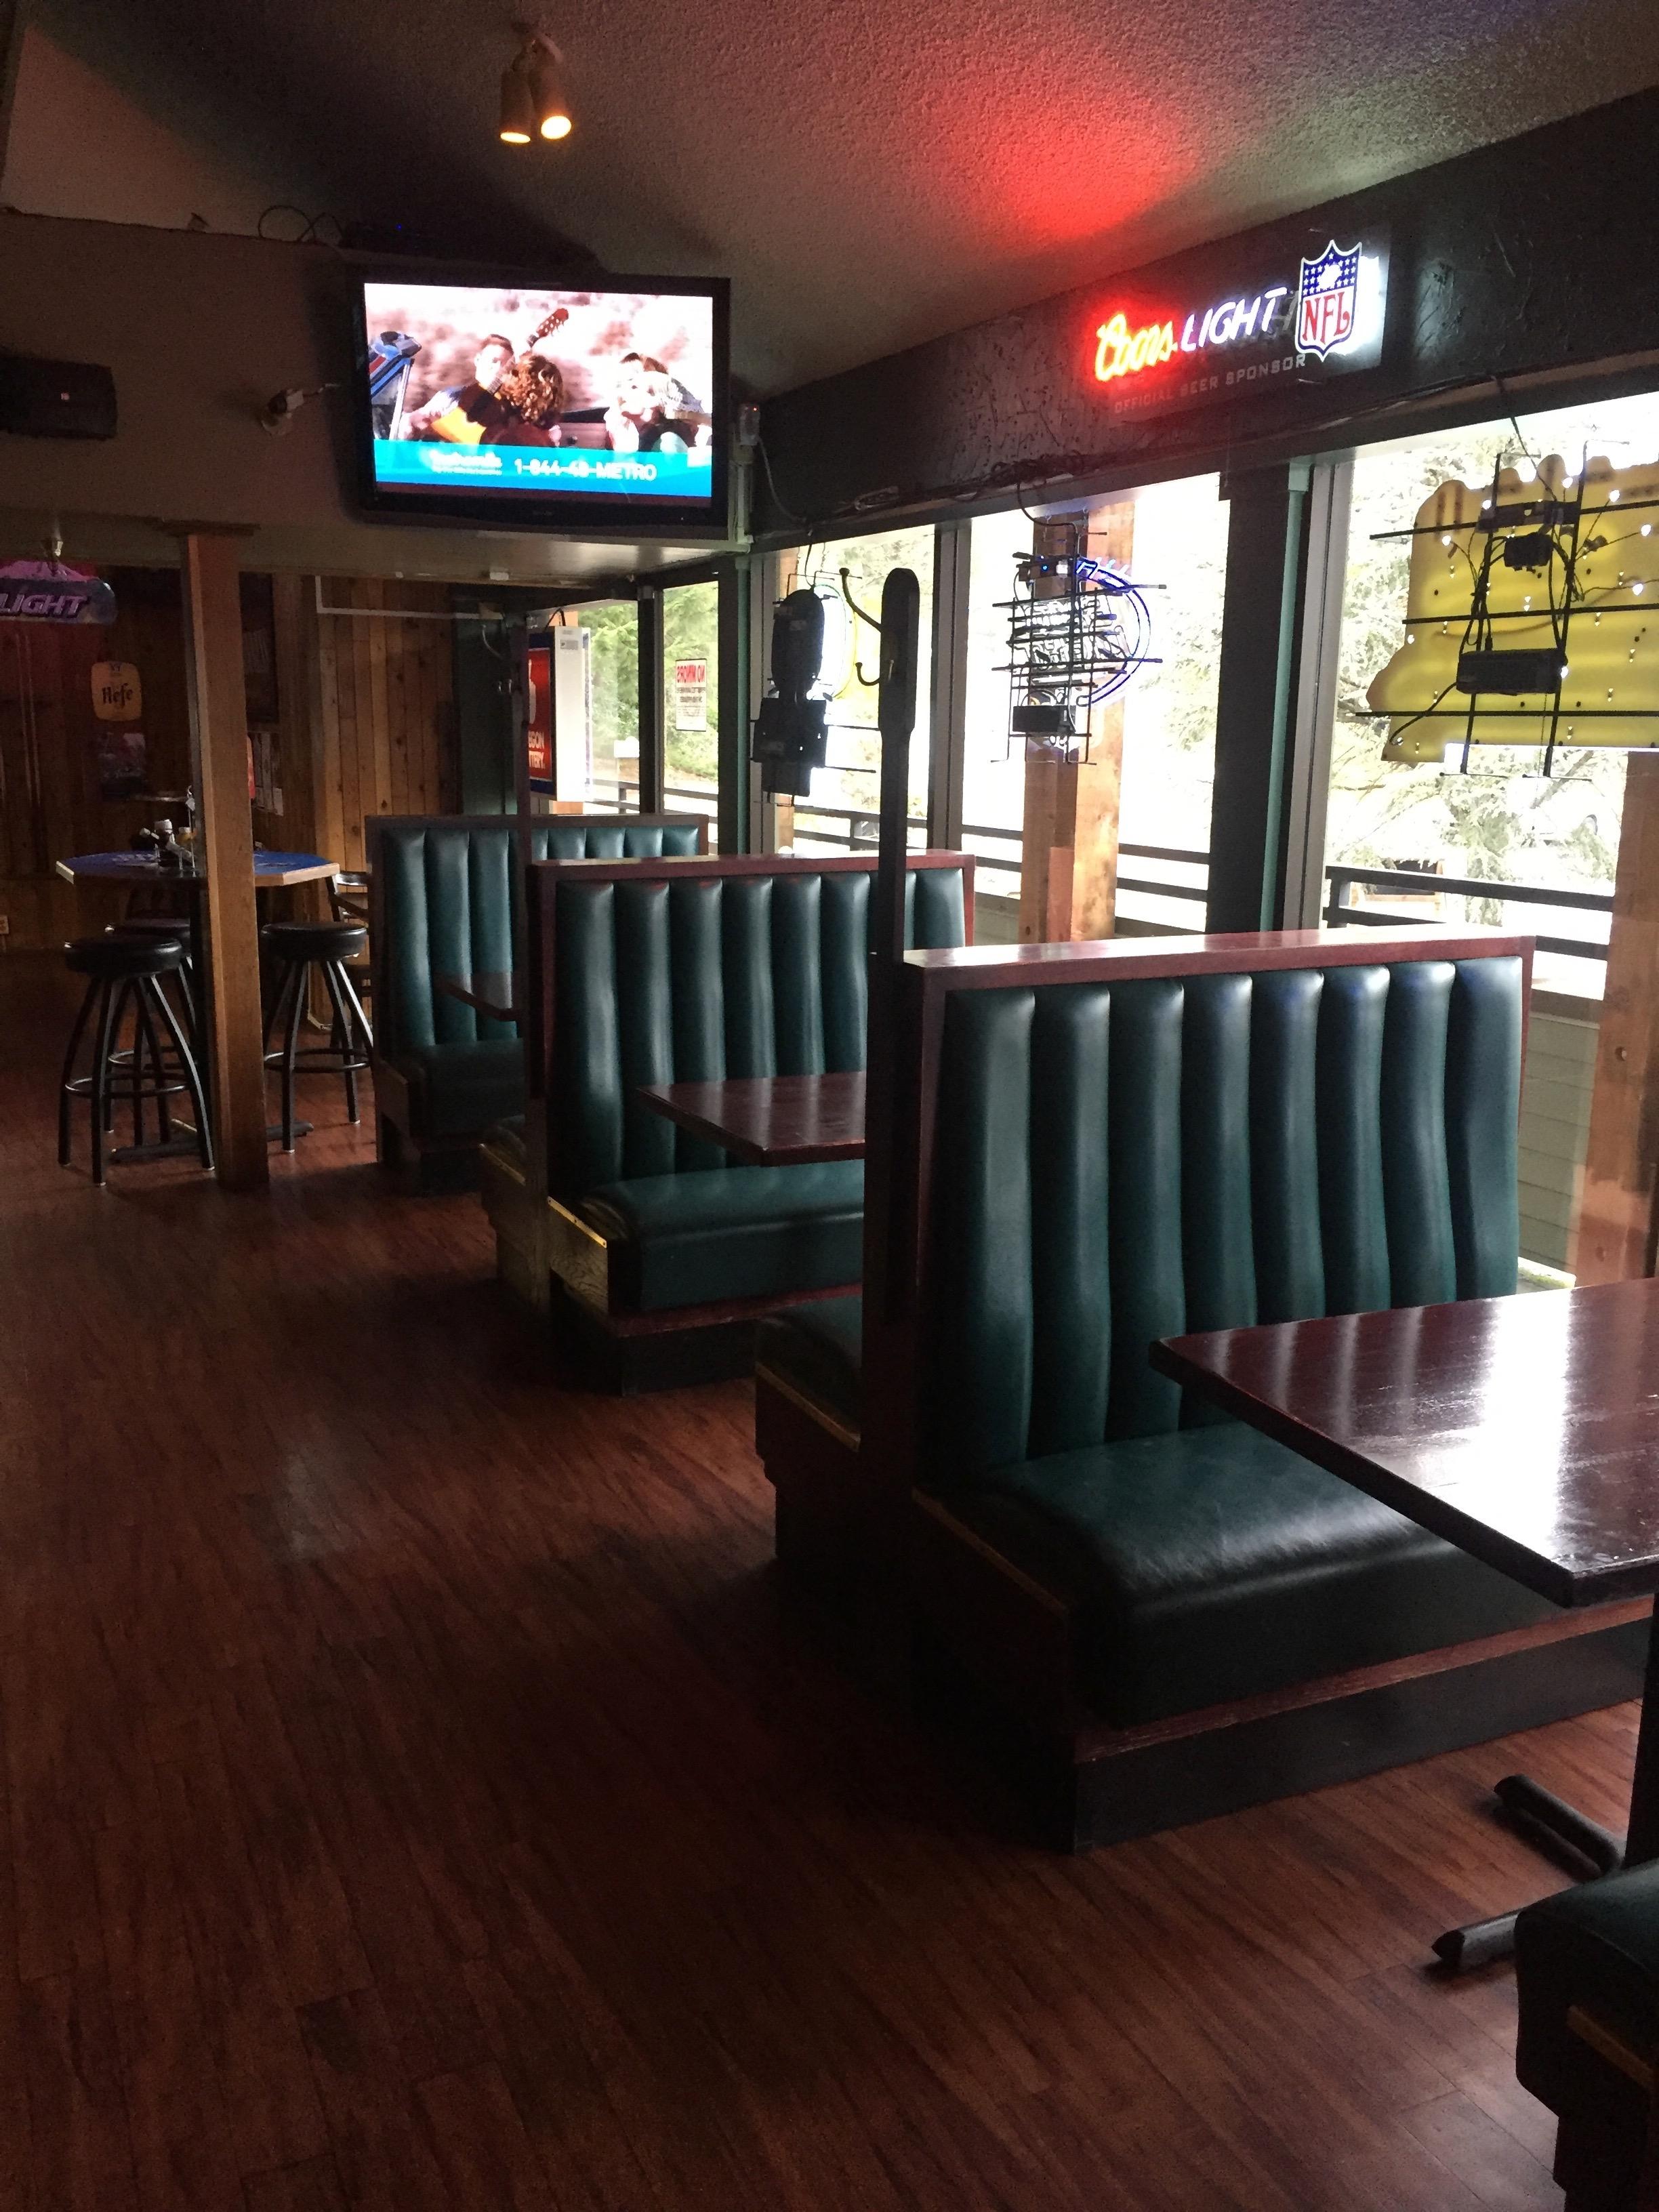 Hanko's Sports Bar & Grill image 6